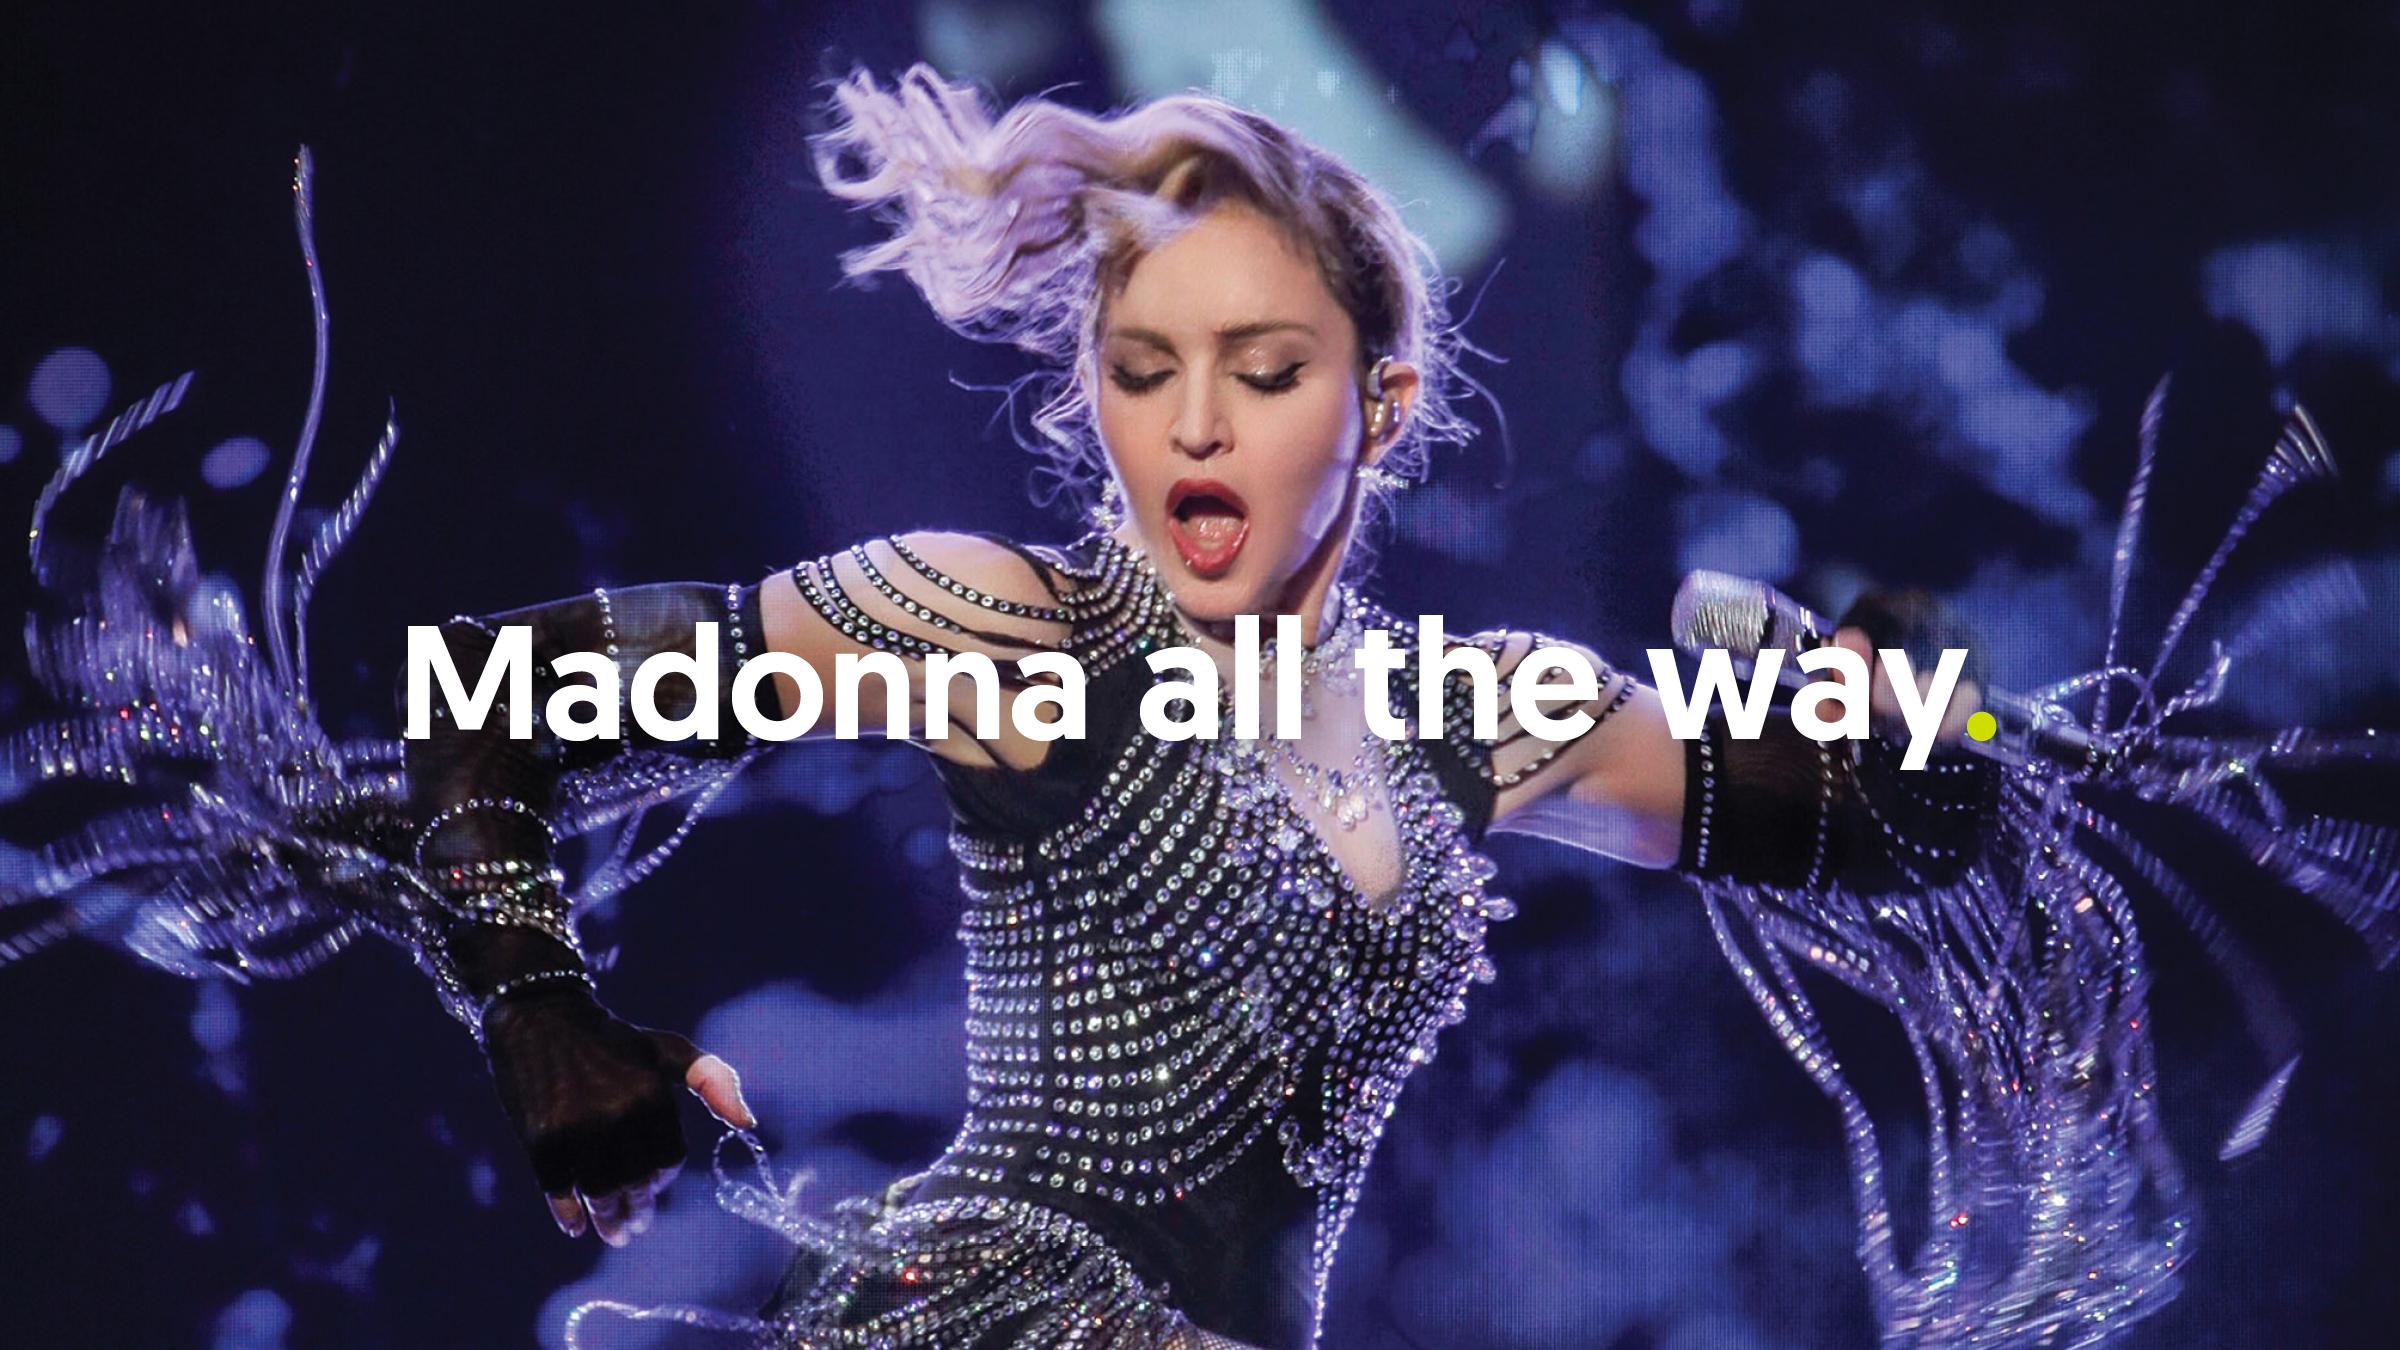 Madonna2